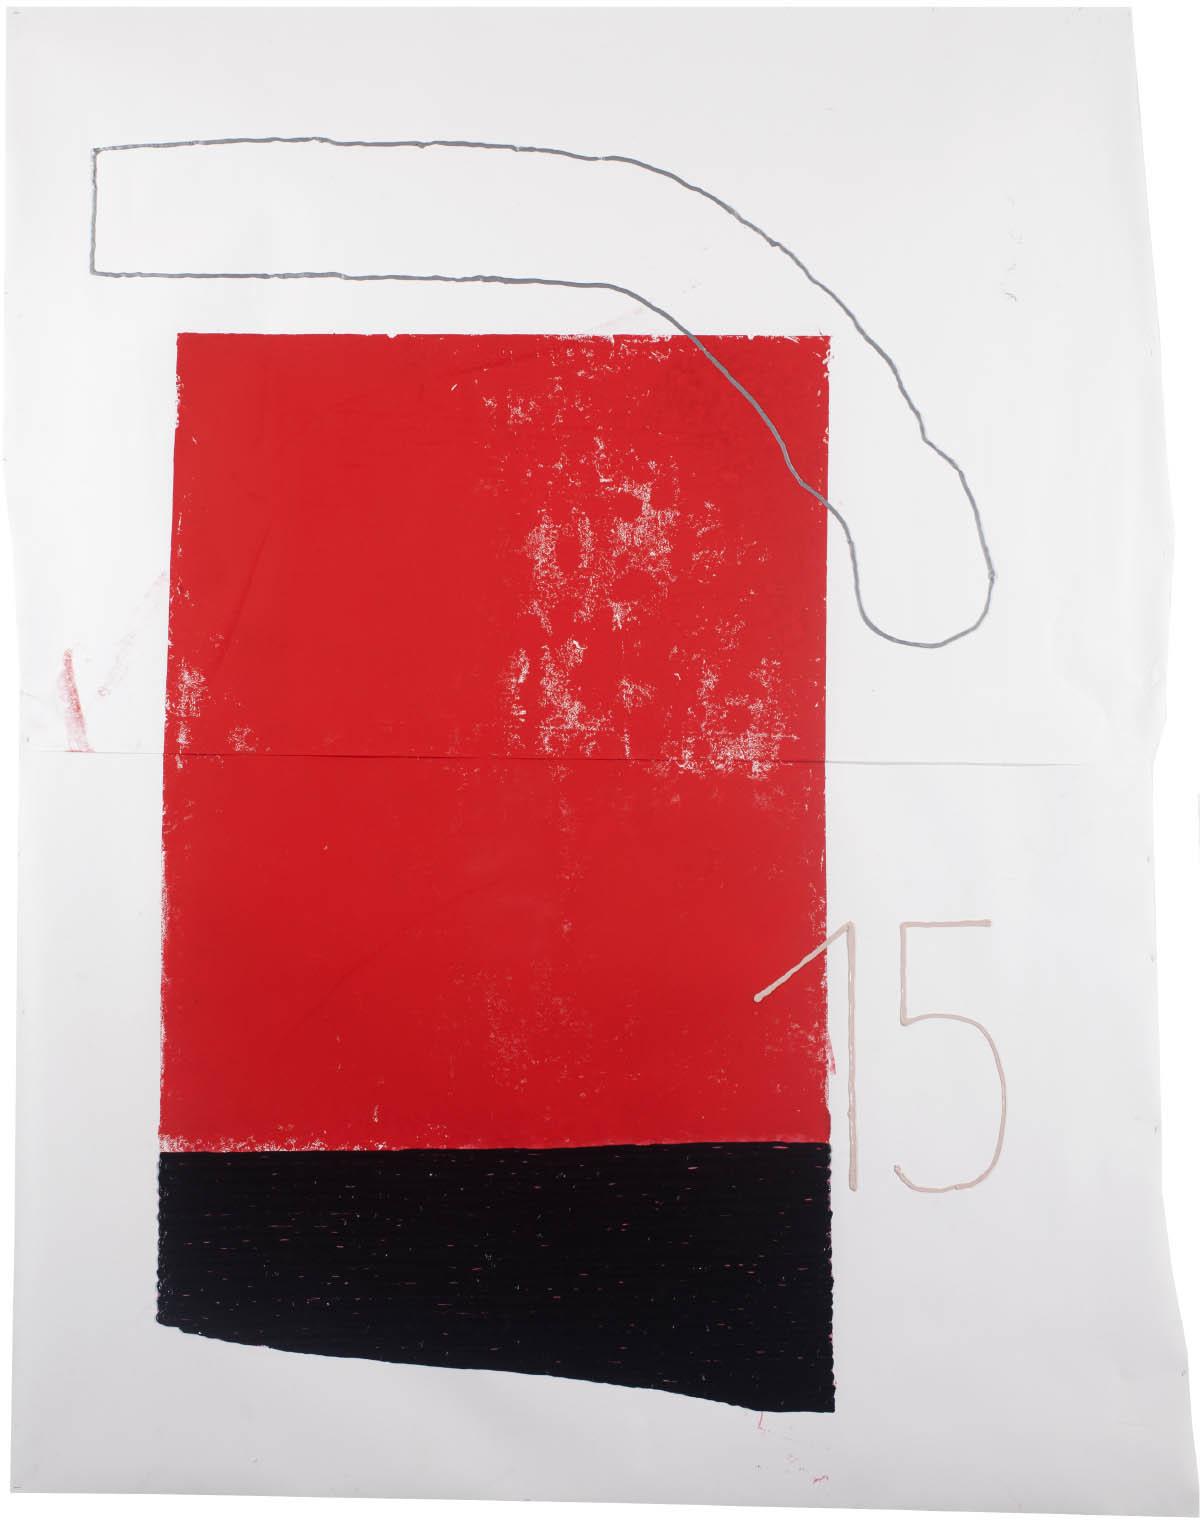 hmm sad, das mmh, 2015, silicon, linolprint on paper, 260cm x 210cm, © Bodo Schlack